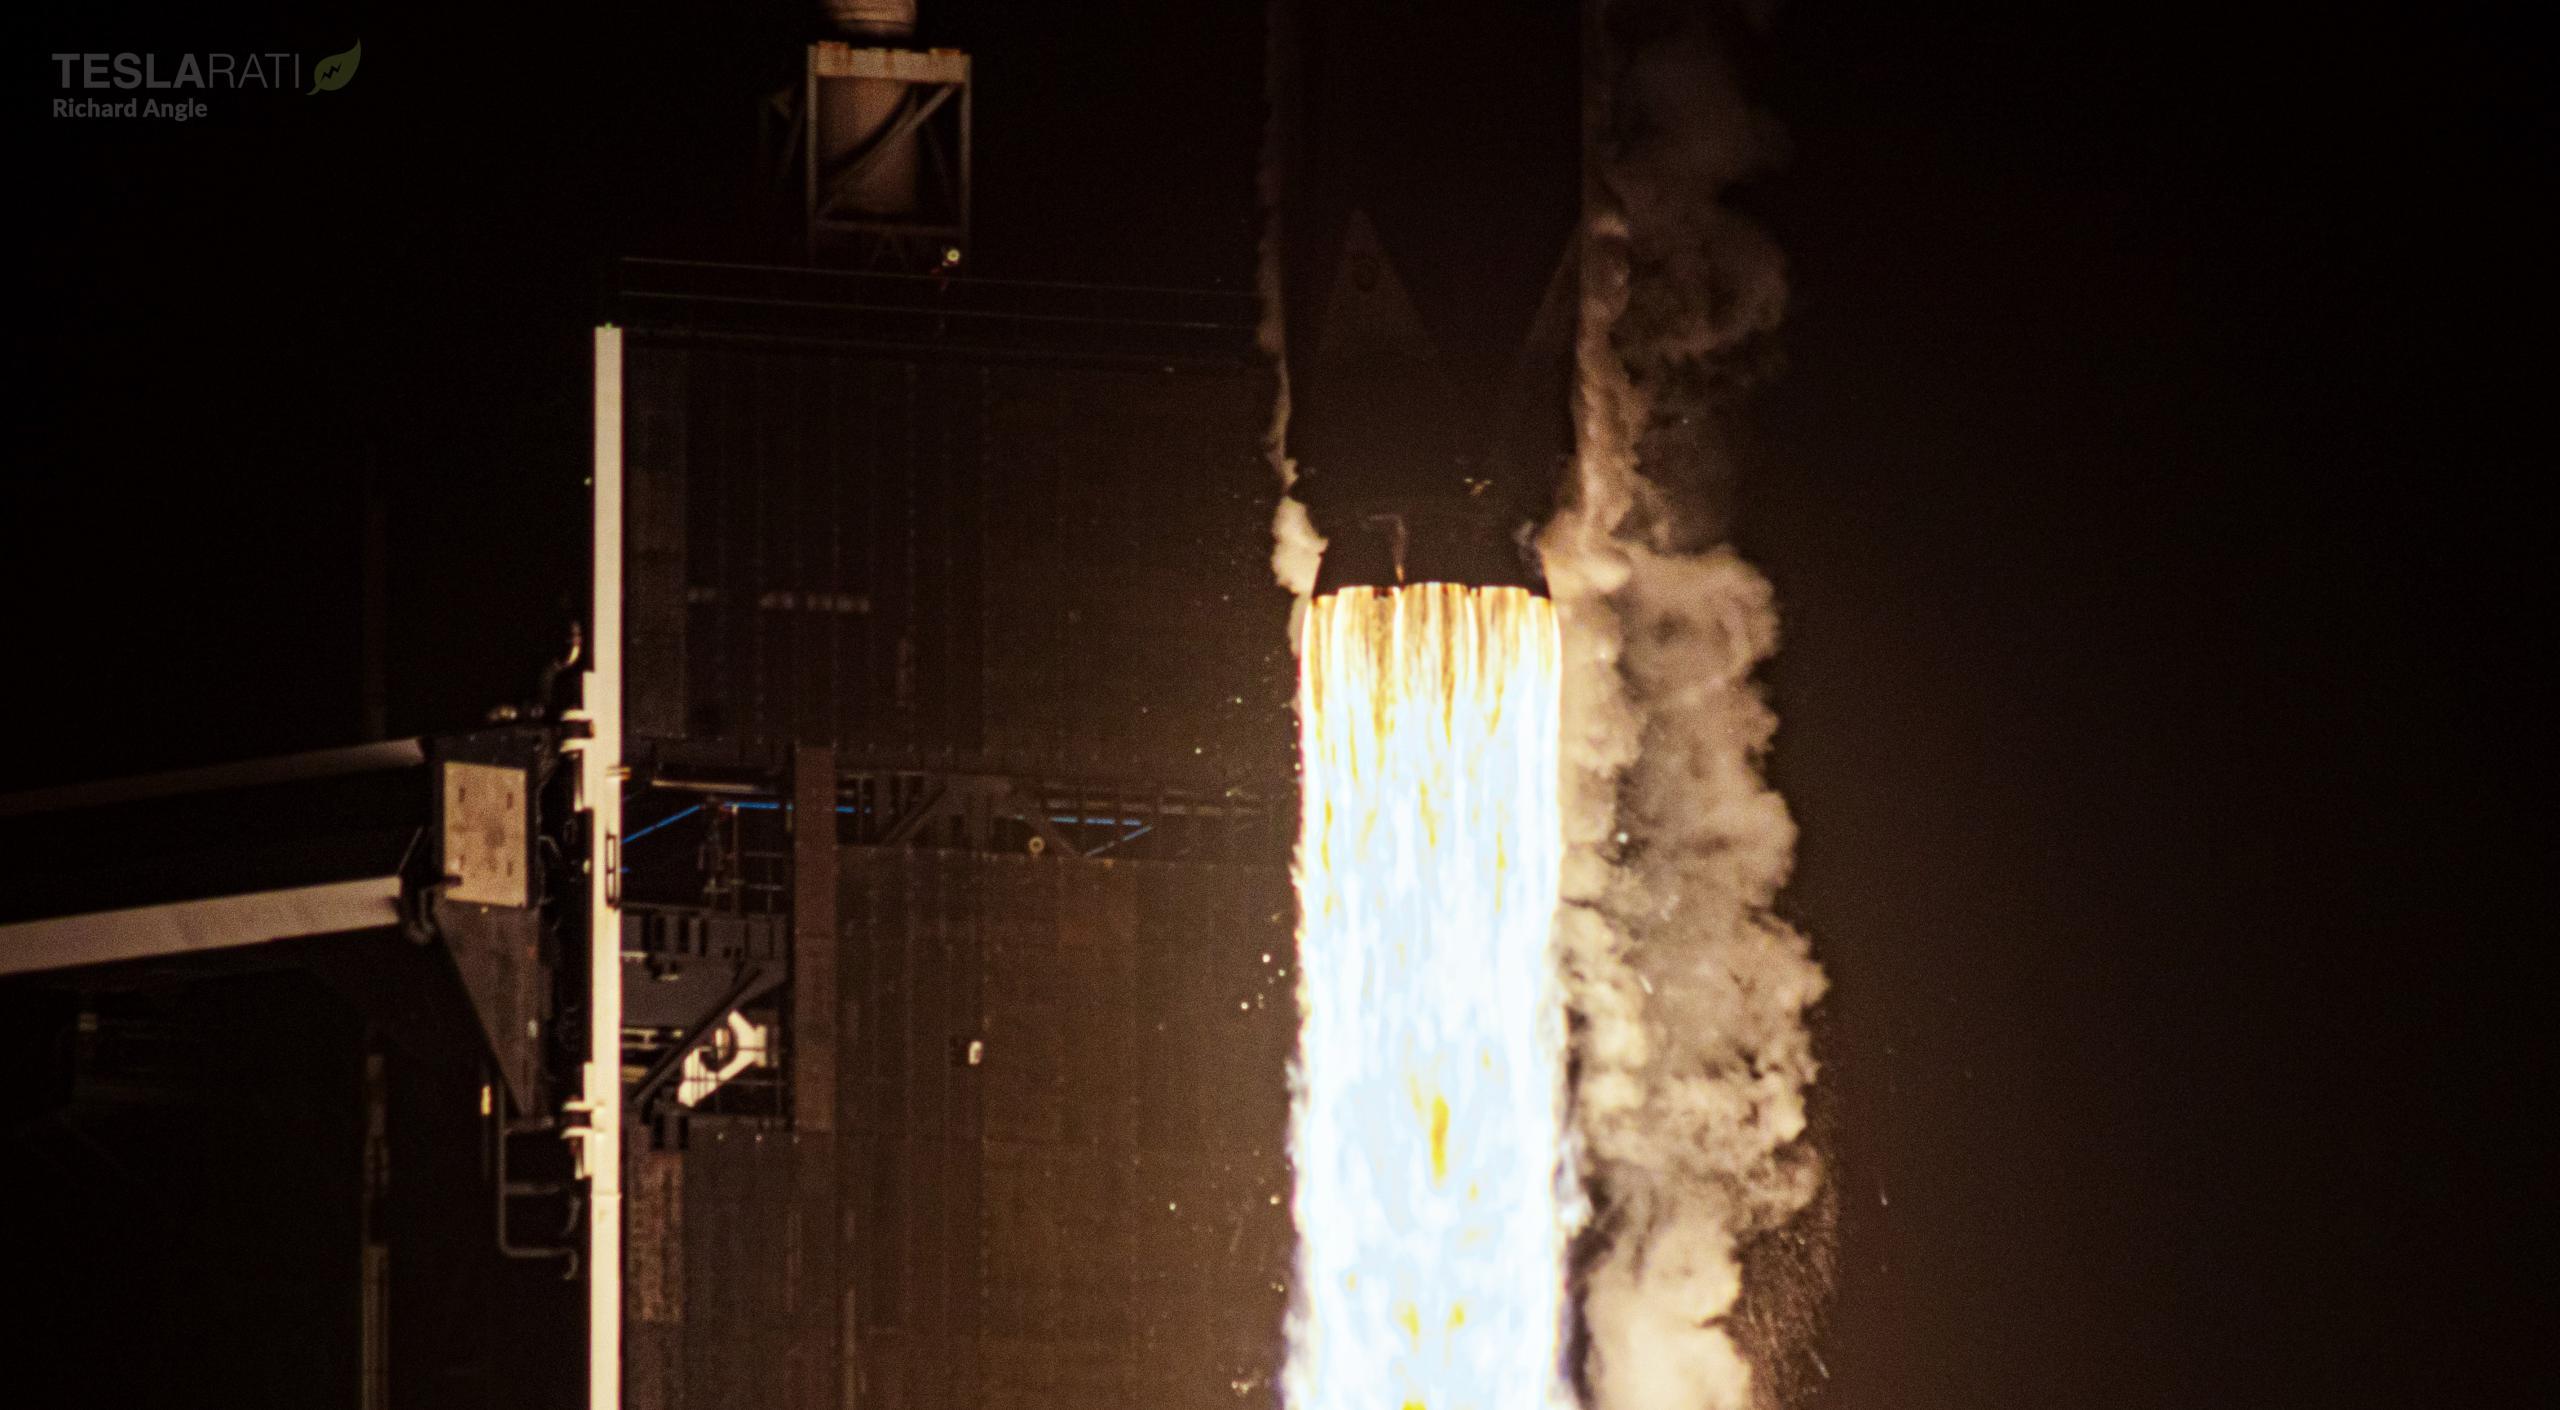 Cargo Dragon 2 CRS-23 Falcon 9 B1061 39A 082921 (Richard Angle) 2 crop (c)